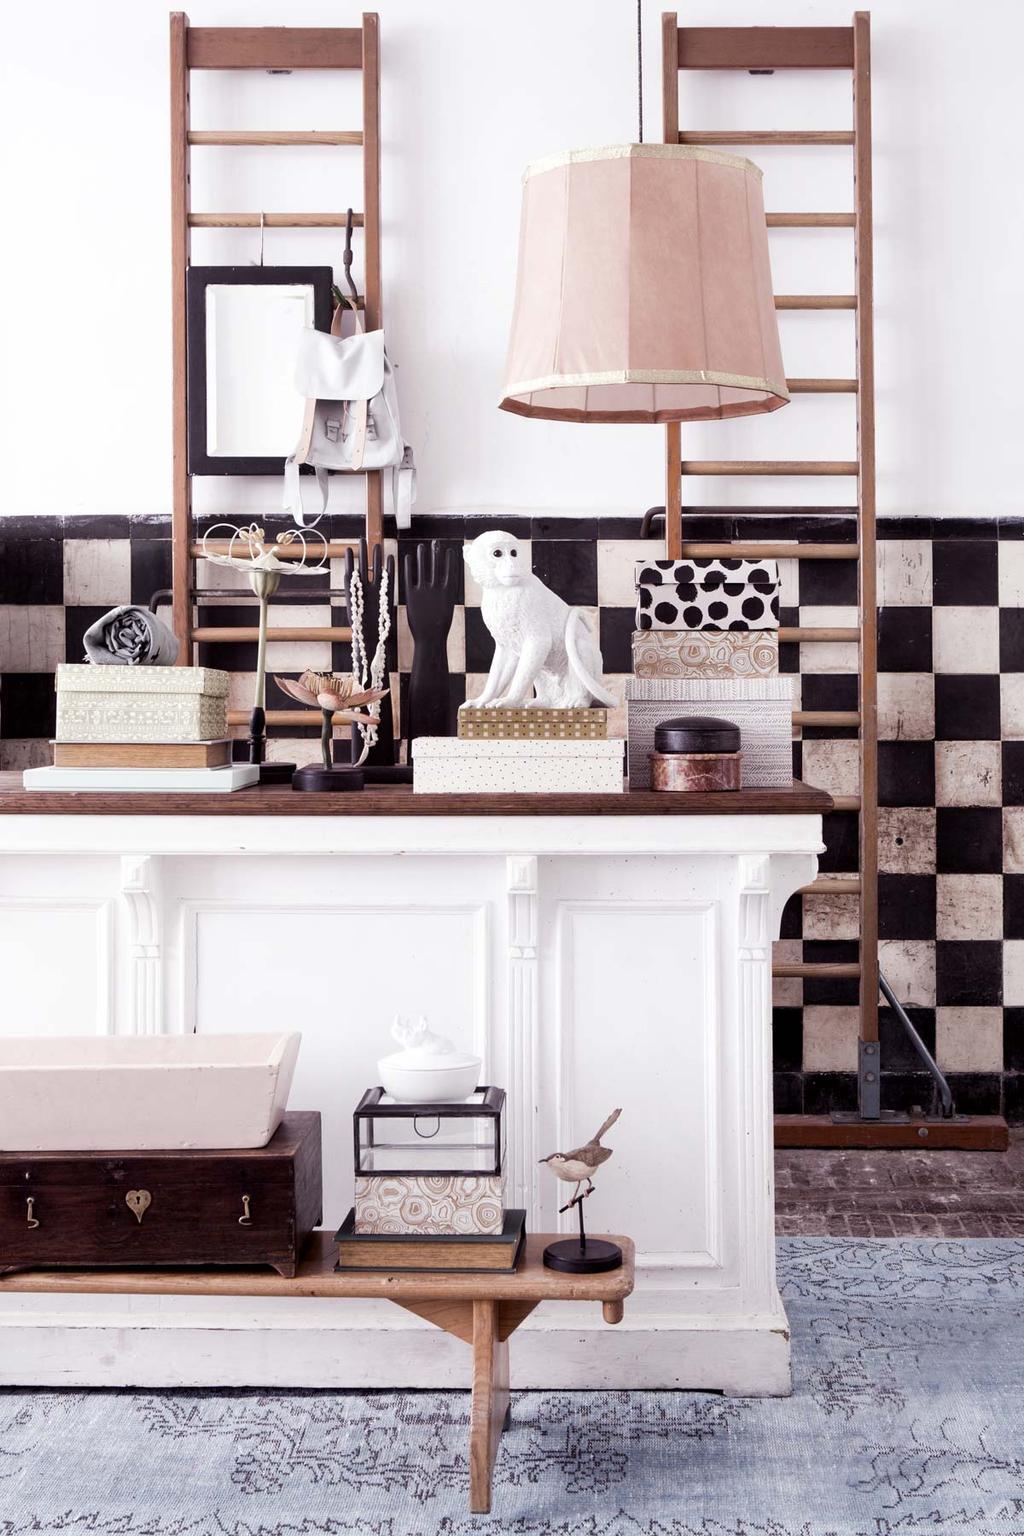 Tienerkamer met wandrek en zwart wit muur tegel lambrisering, opbergdoosjes